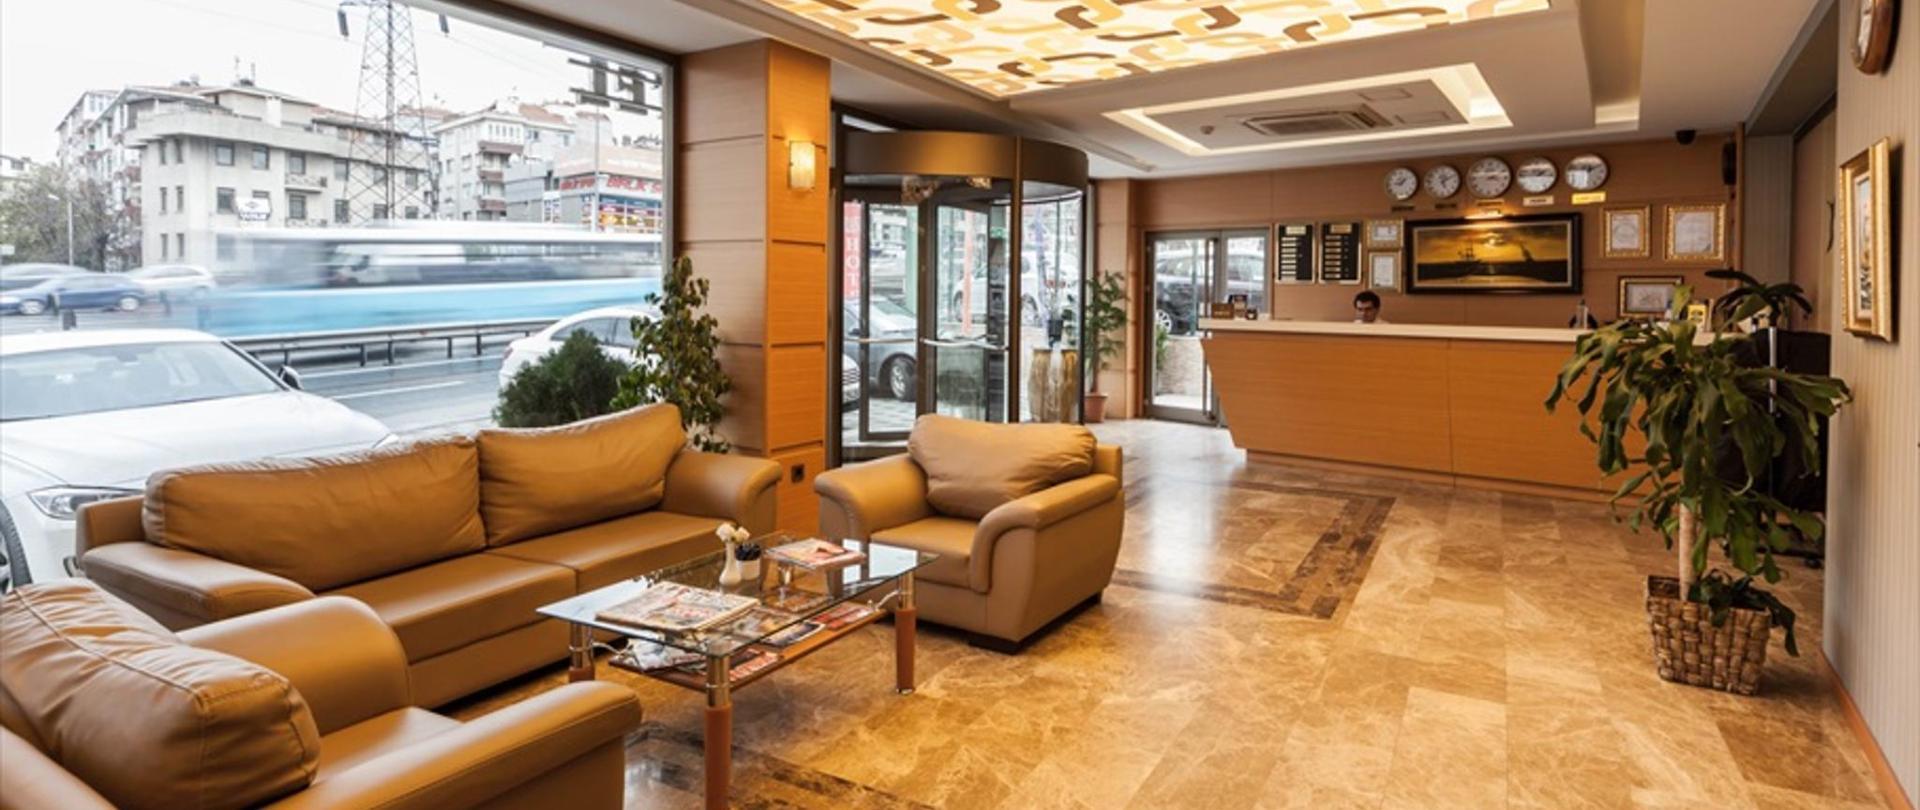 hotels in istanbul.jpg